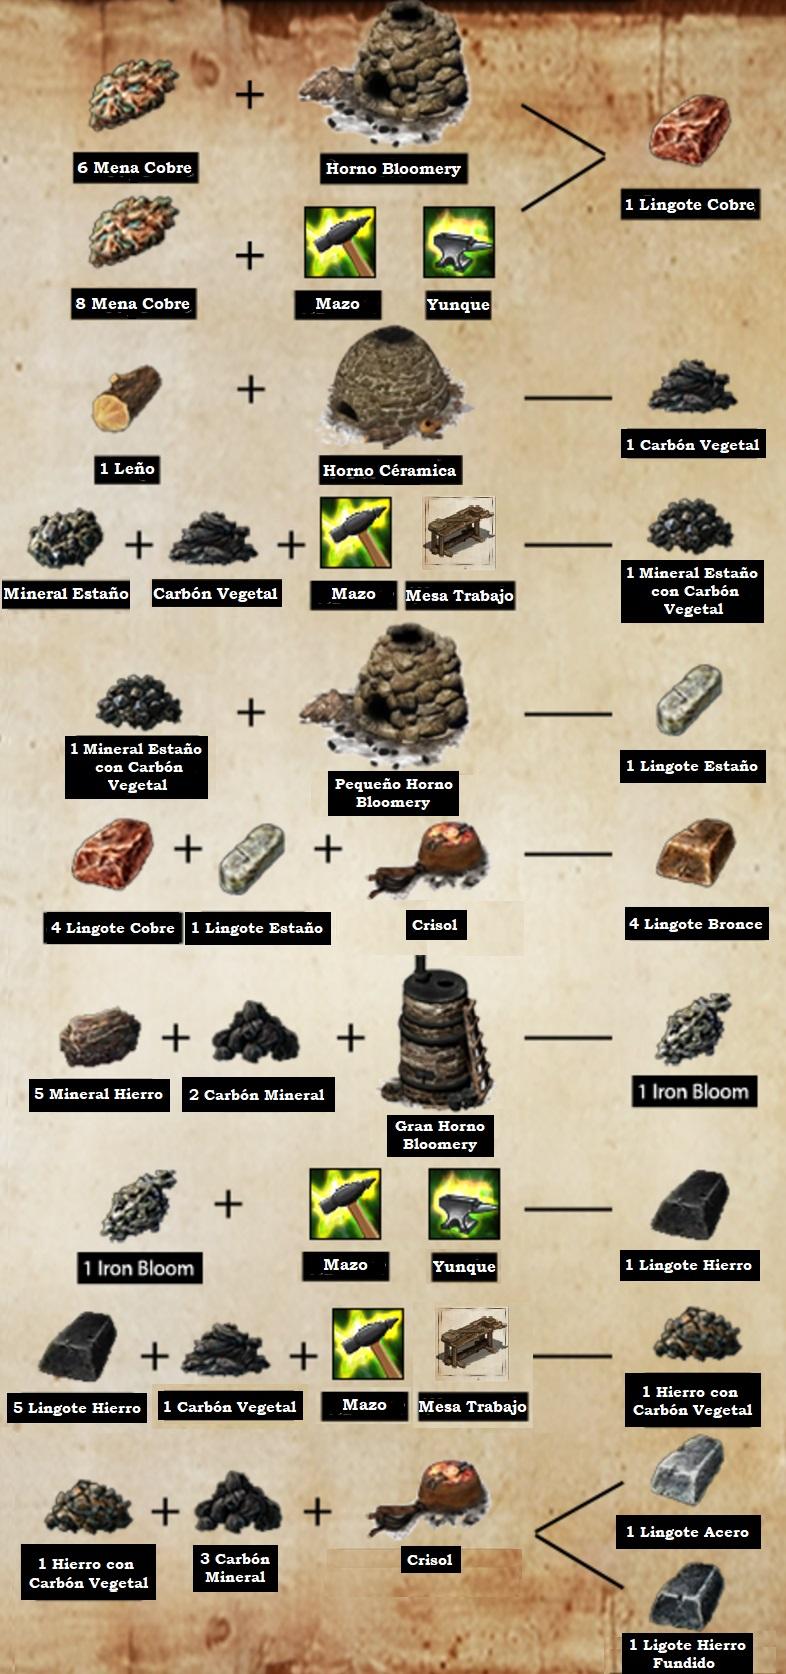 0_1502506547247_Fabricar Minerales.jpg